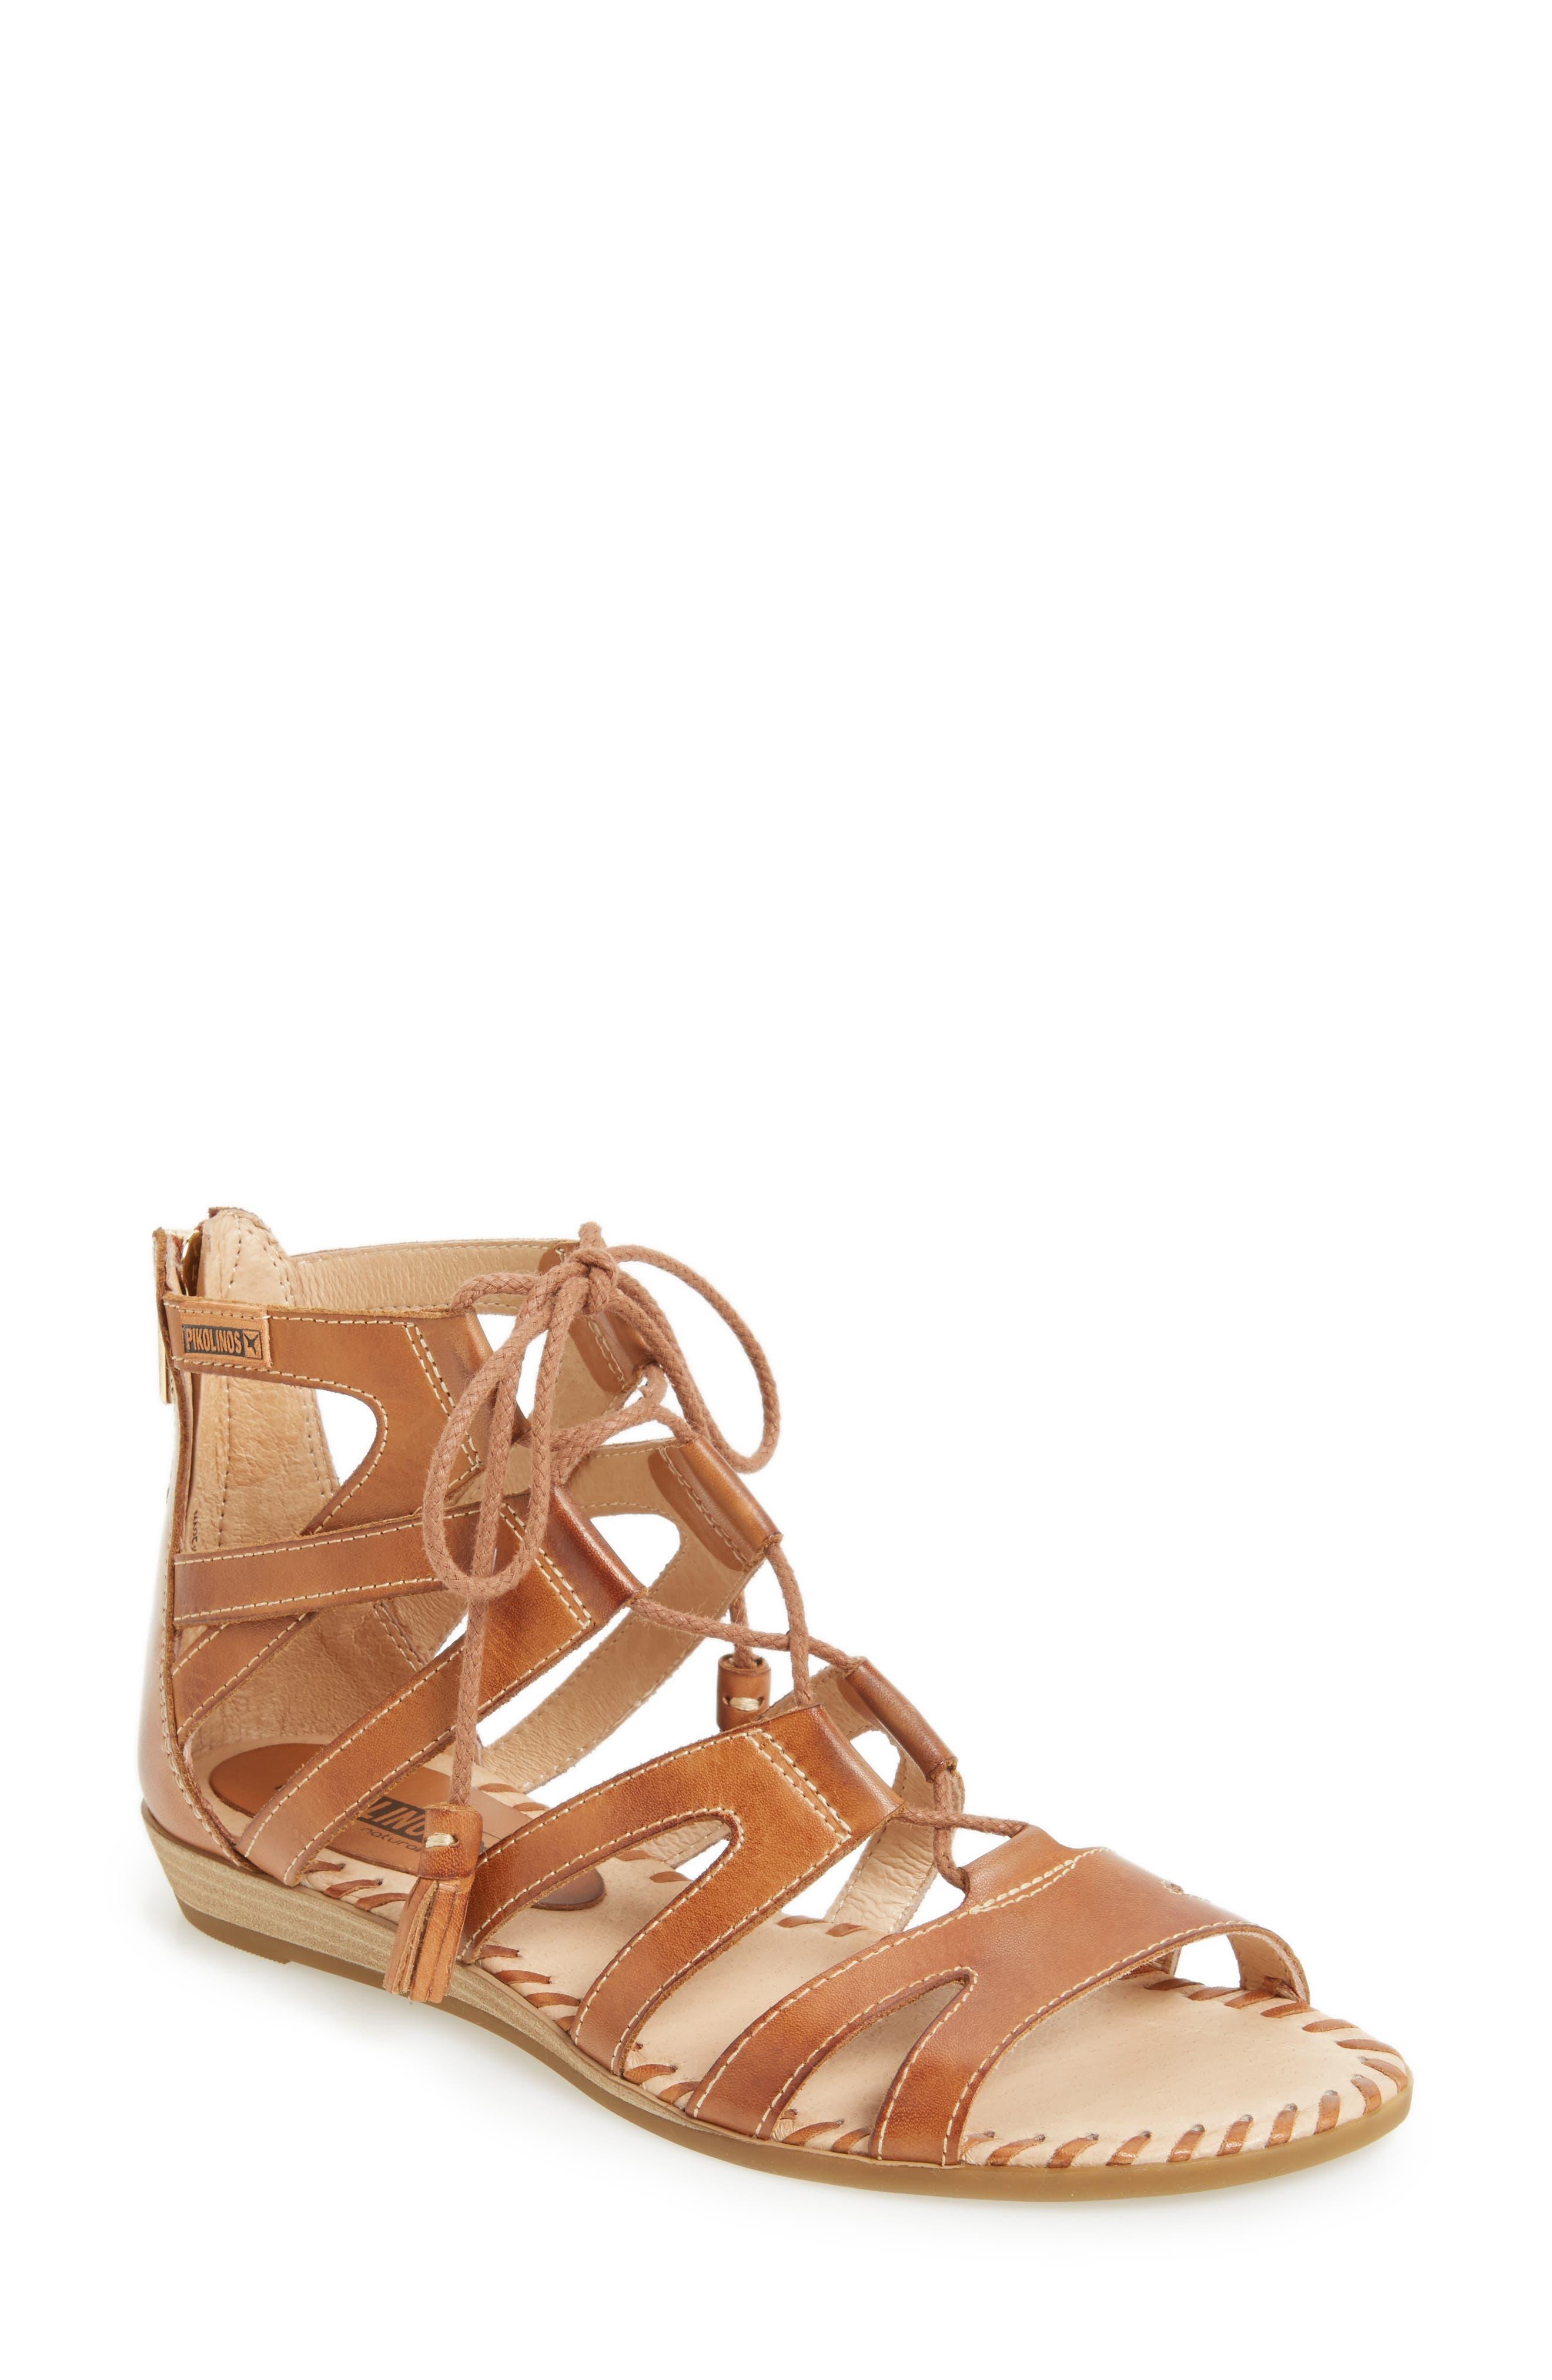 'Alcudia' Lace-Up Sandal,                             Main thumbnail 1, color,